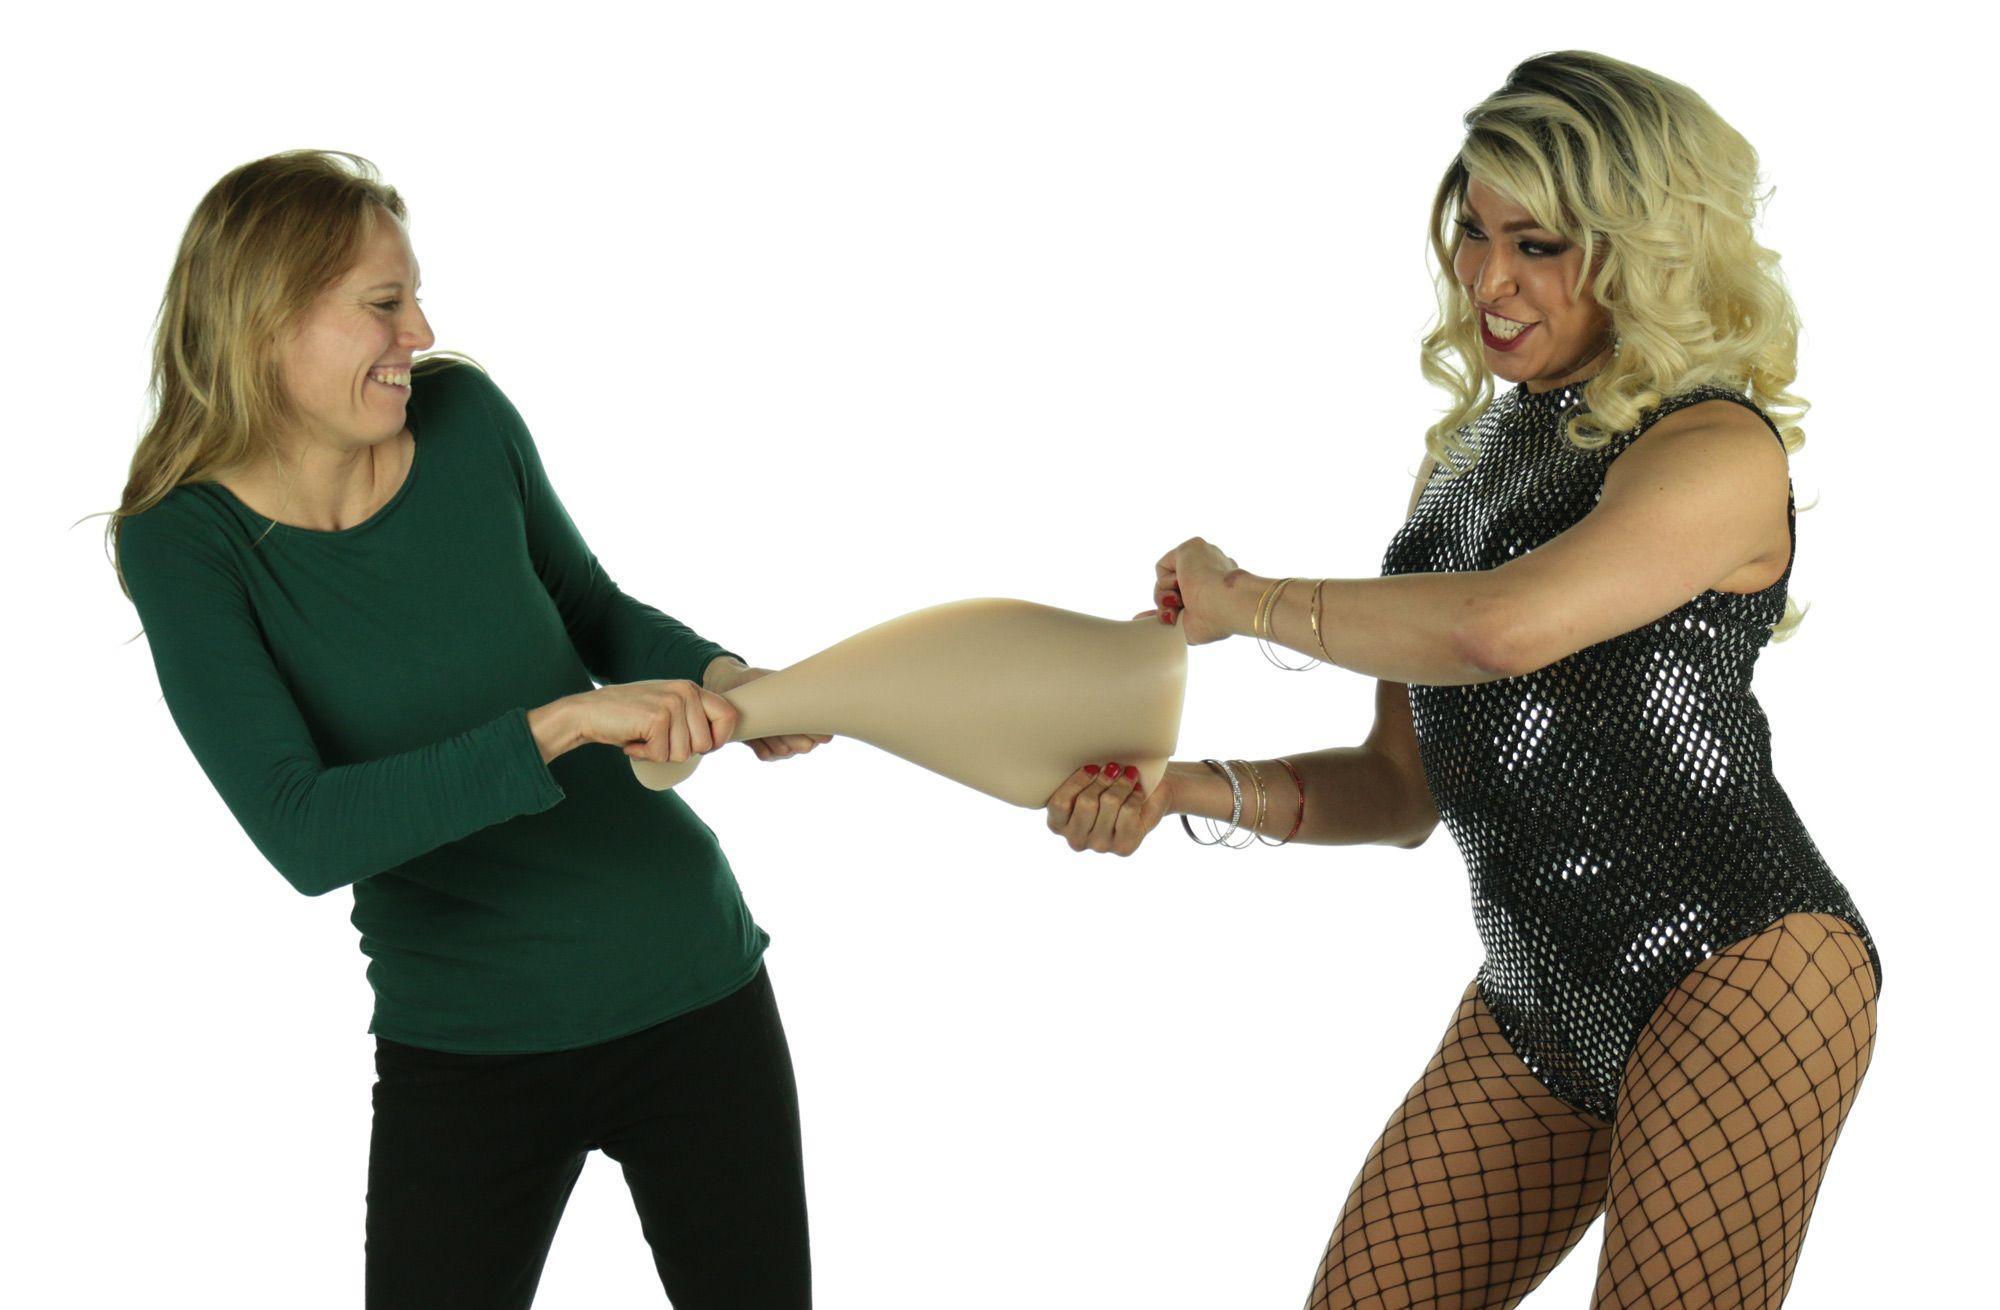 Transvestite clothing bumper padding